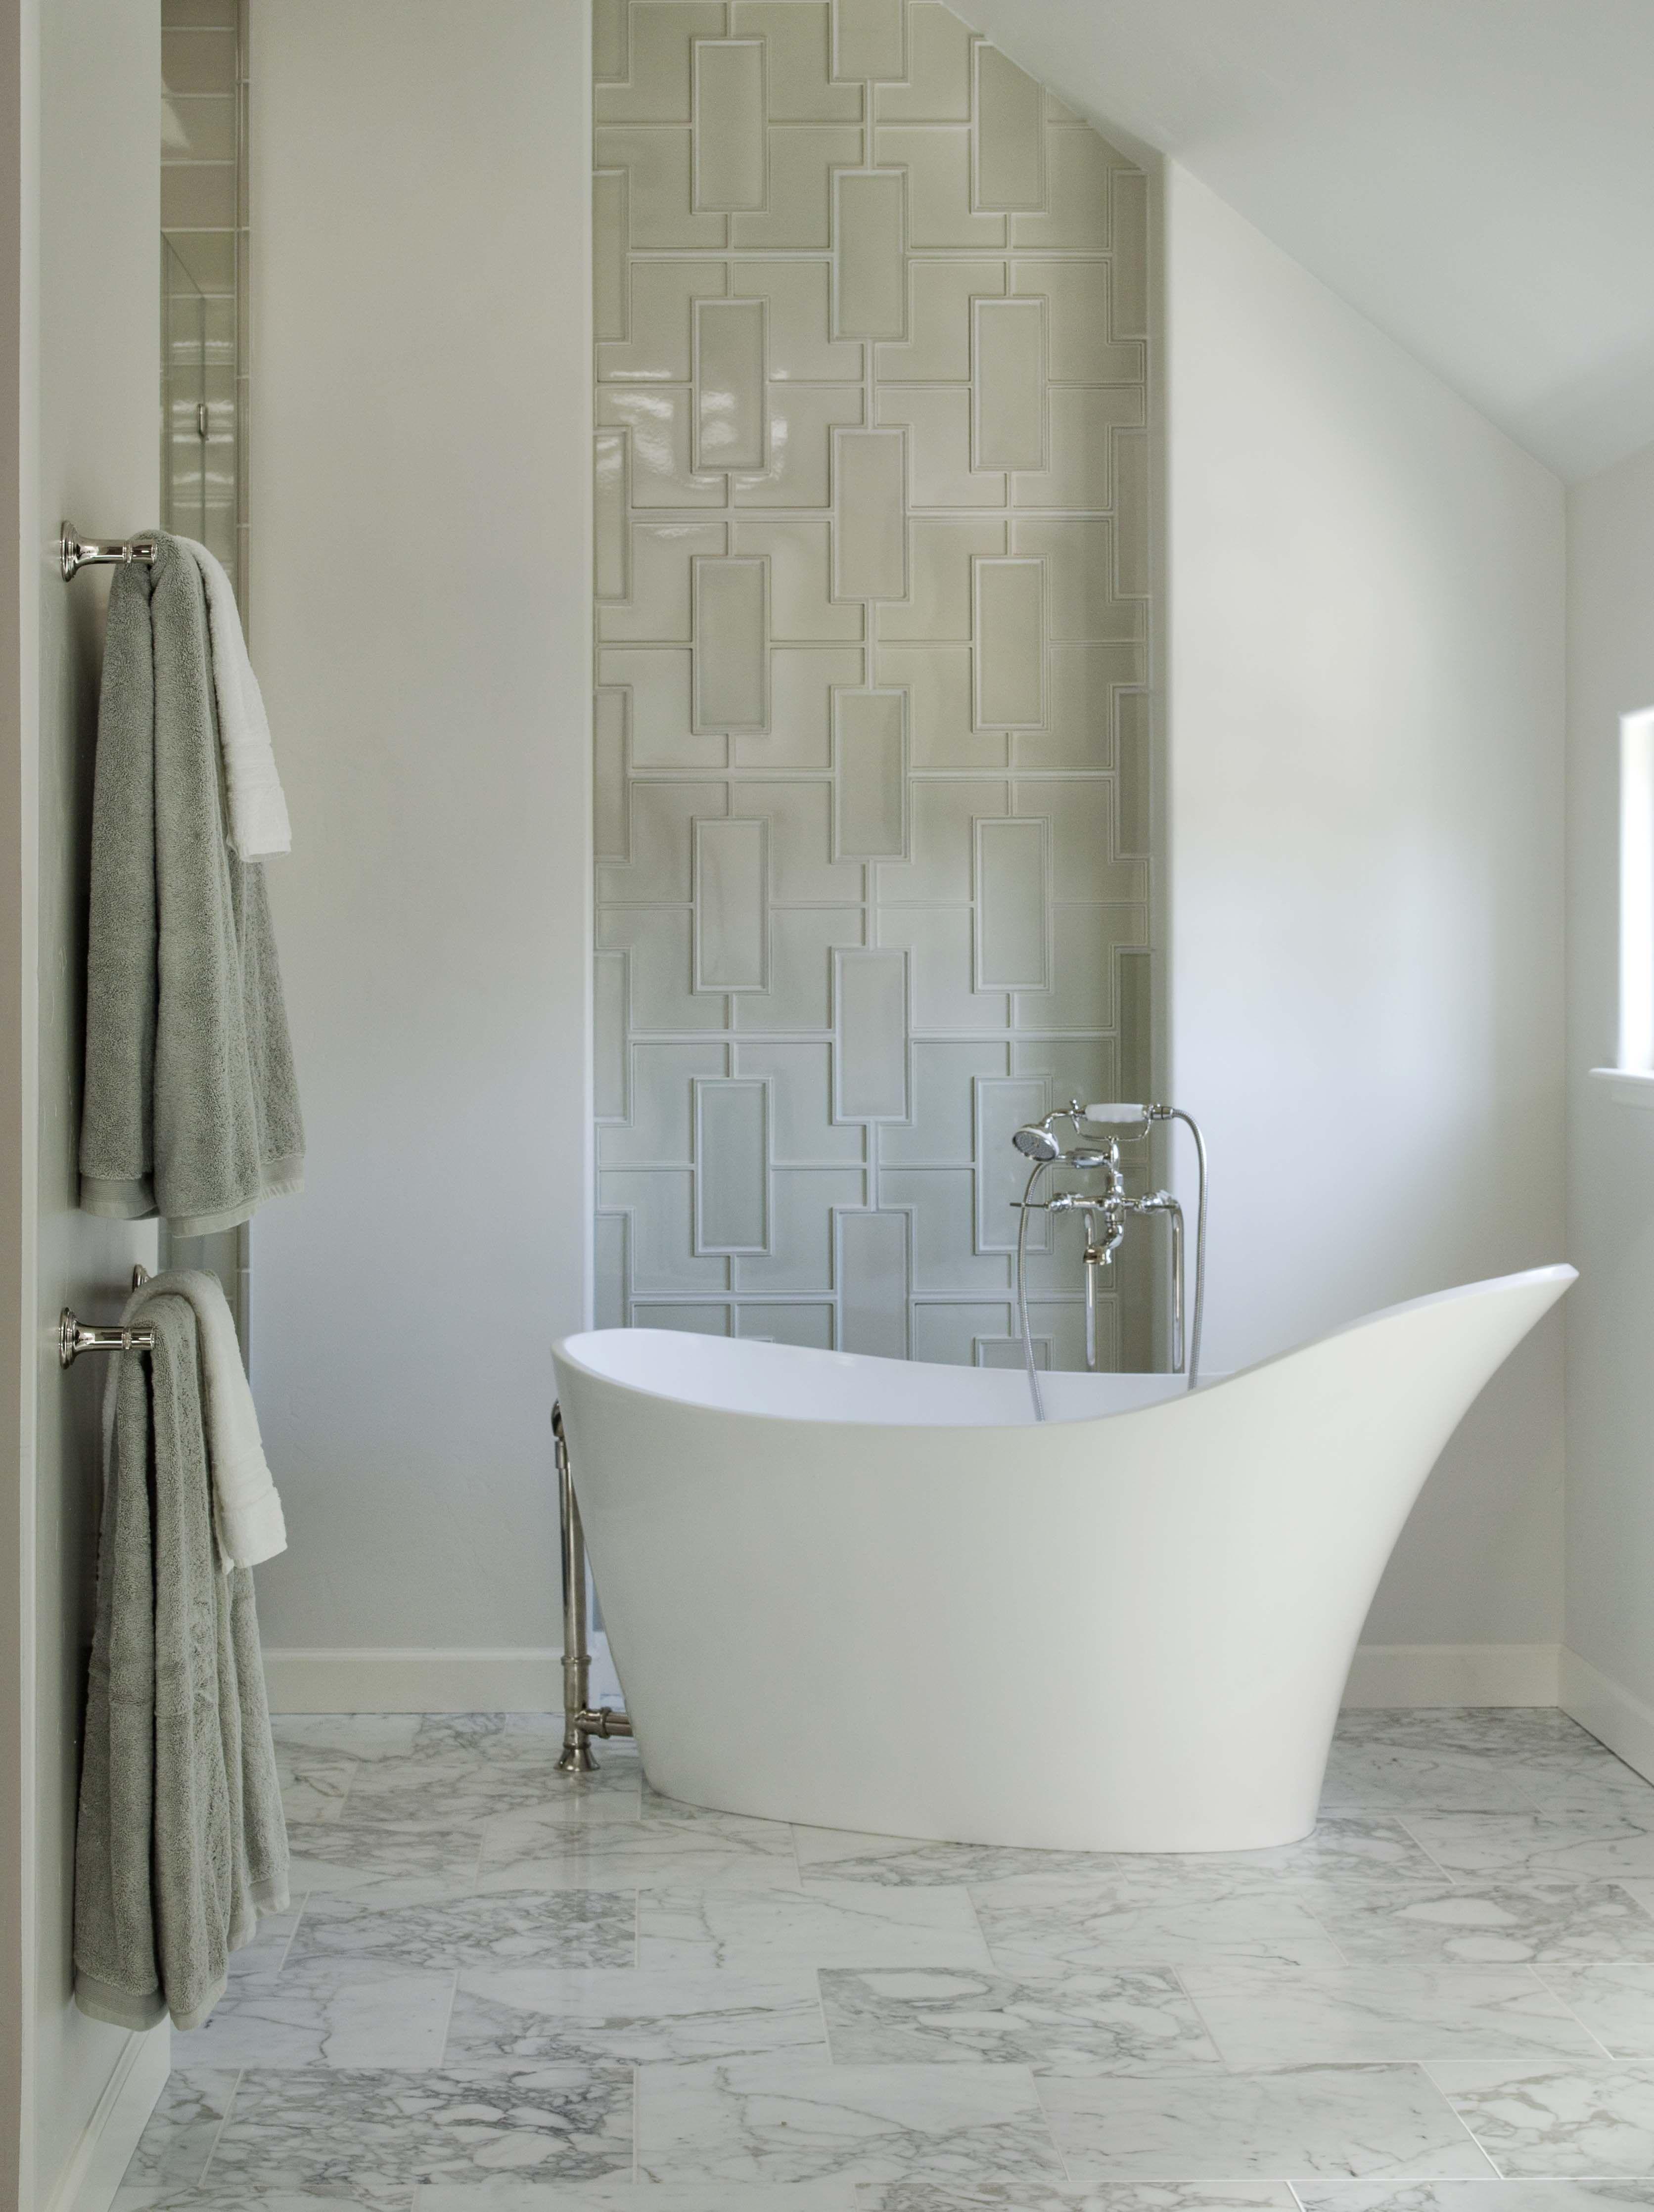 Pin by Candice Willett-Shedlarski on Baths (Group Board) | Pinterest ...